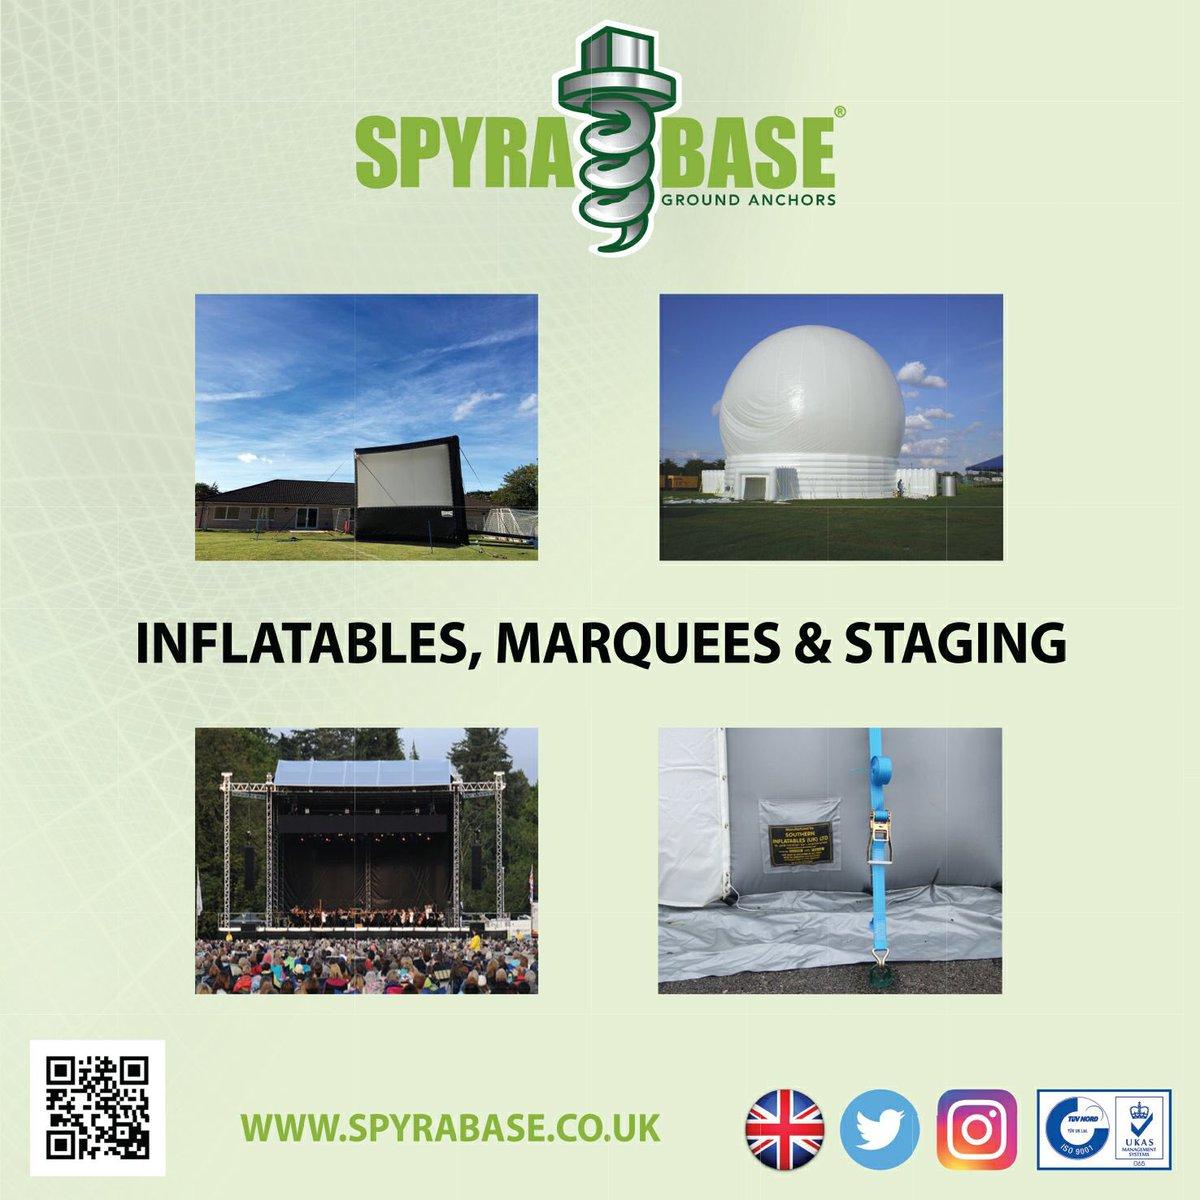 SpyraBase on Twitter: